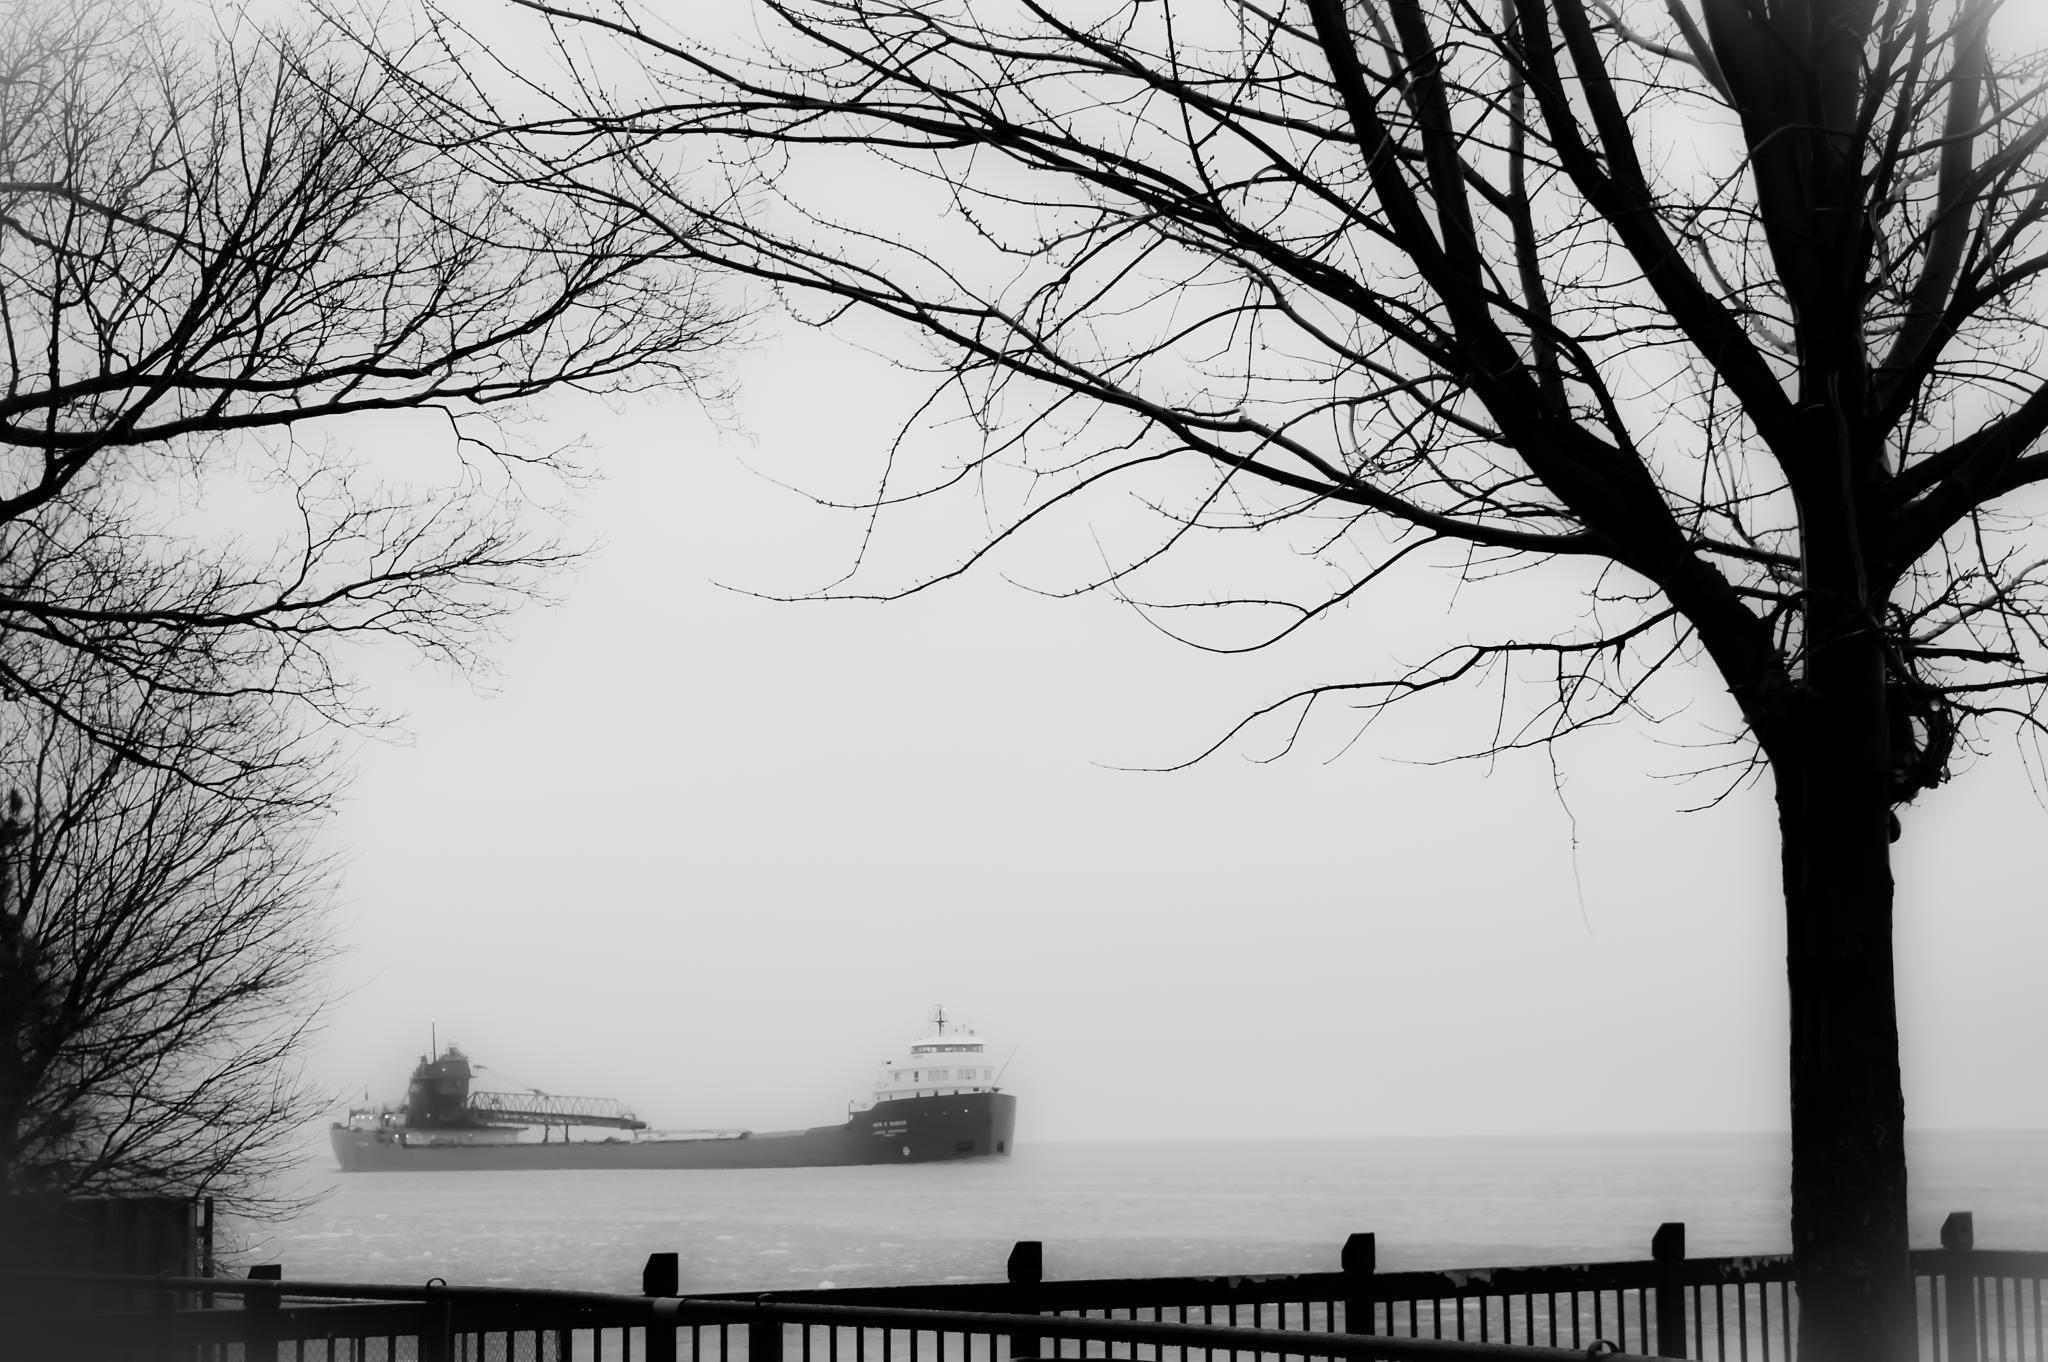 Ship by chuckhildebrandt7